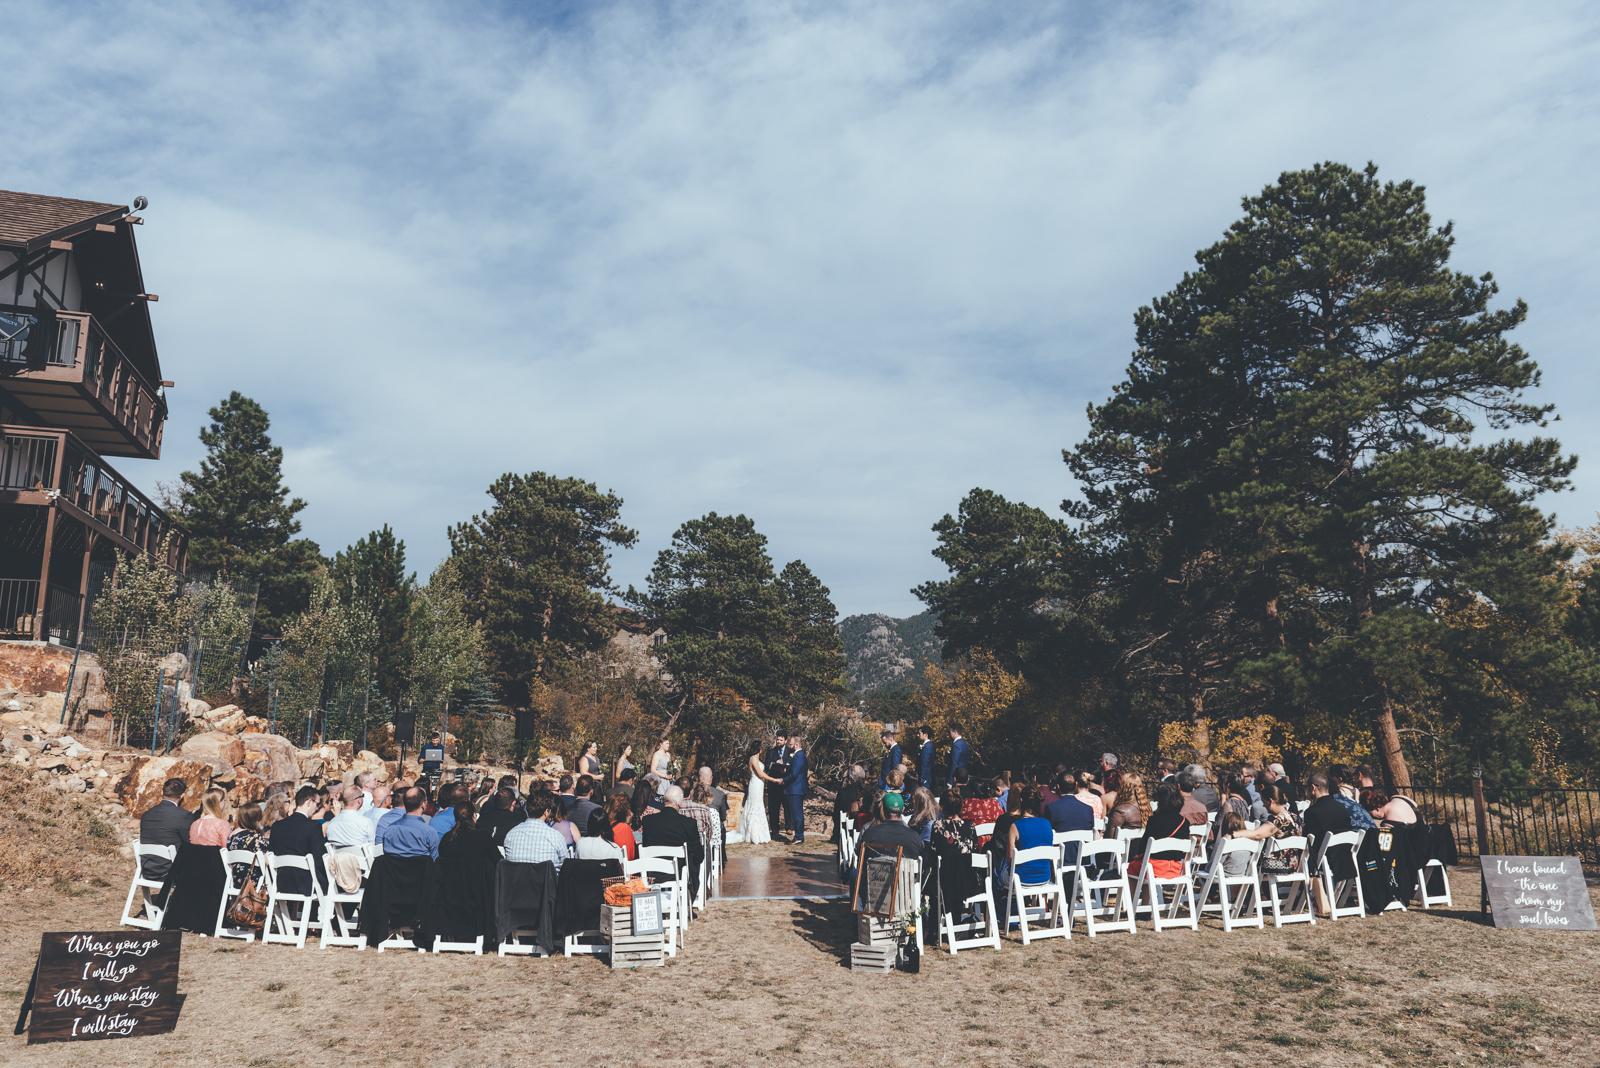 ChadFahnestockPhotography-estes-park-wedding-photography-021.jpg